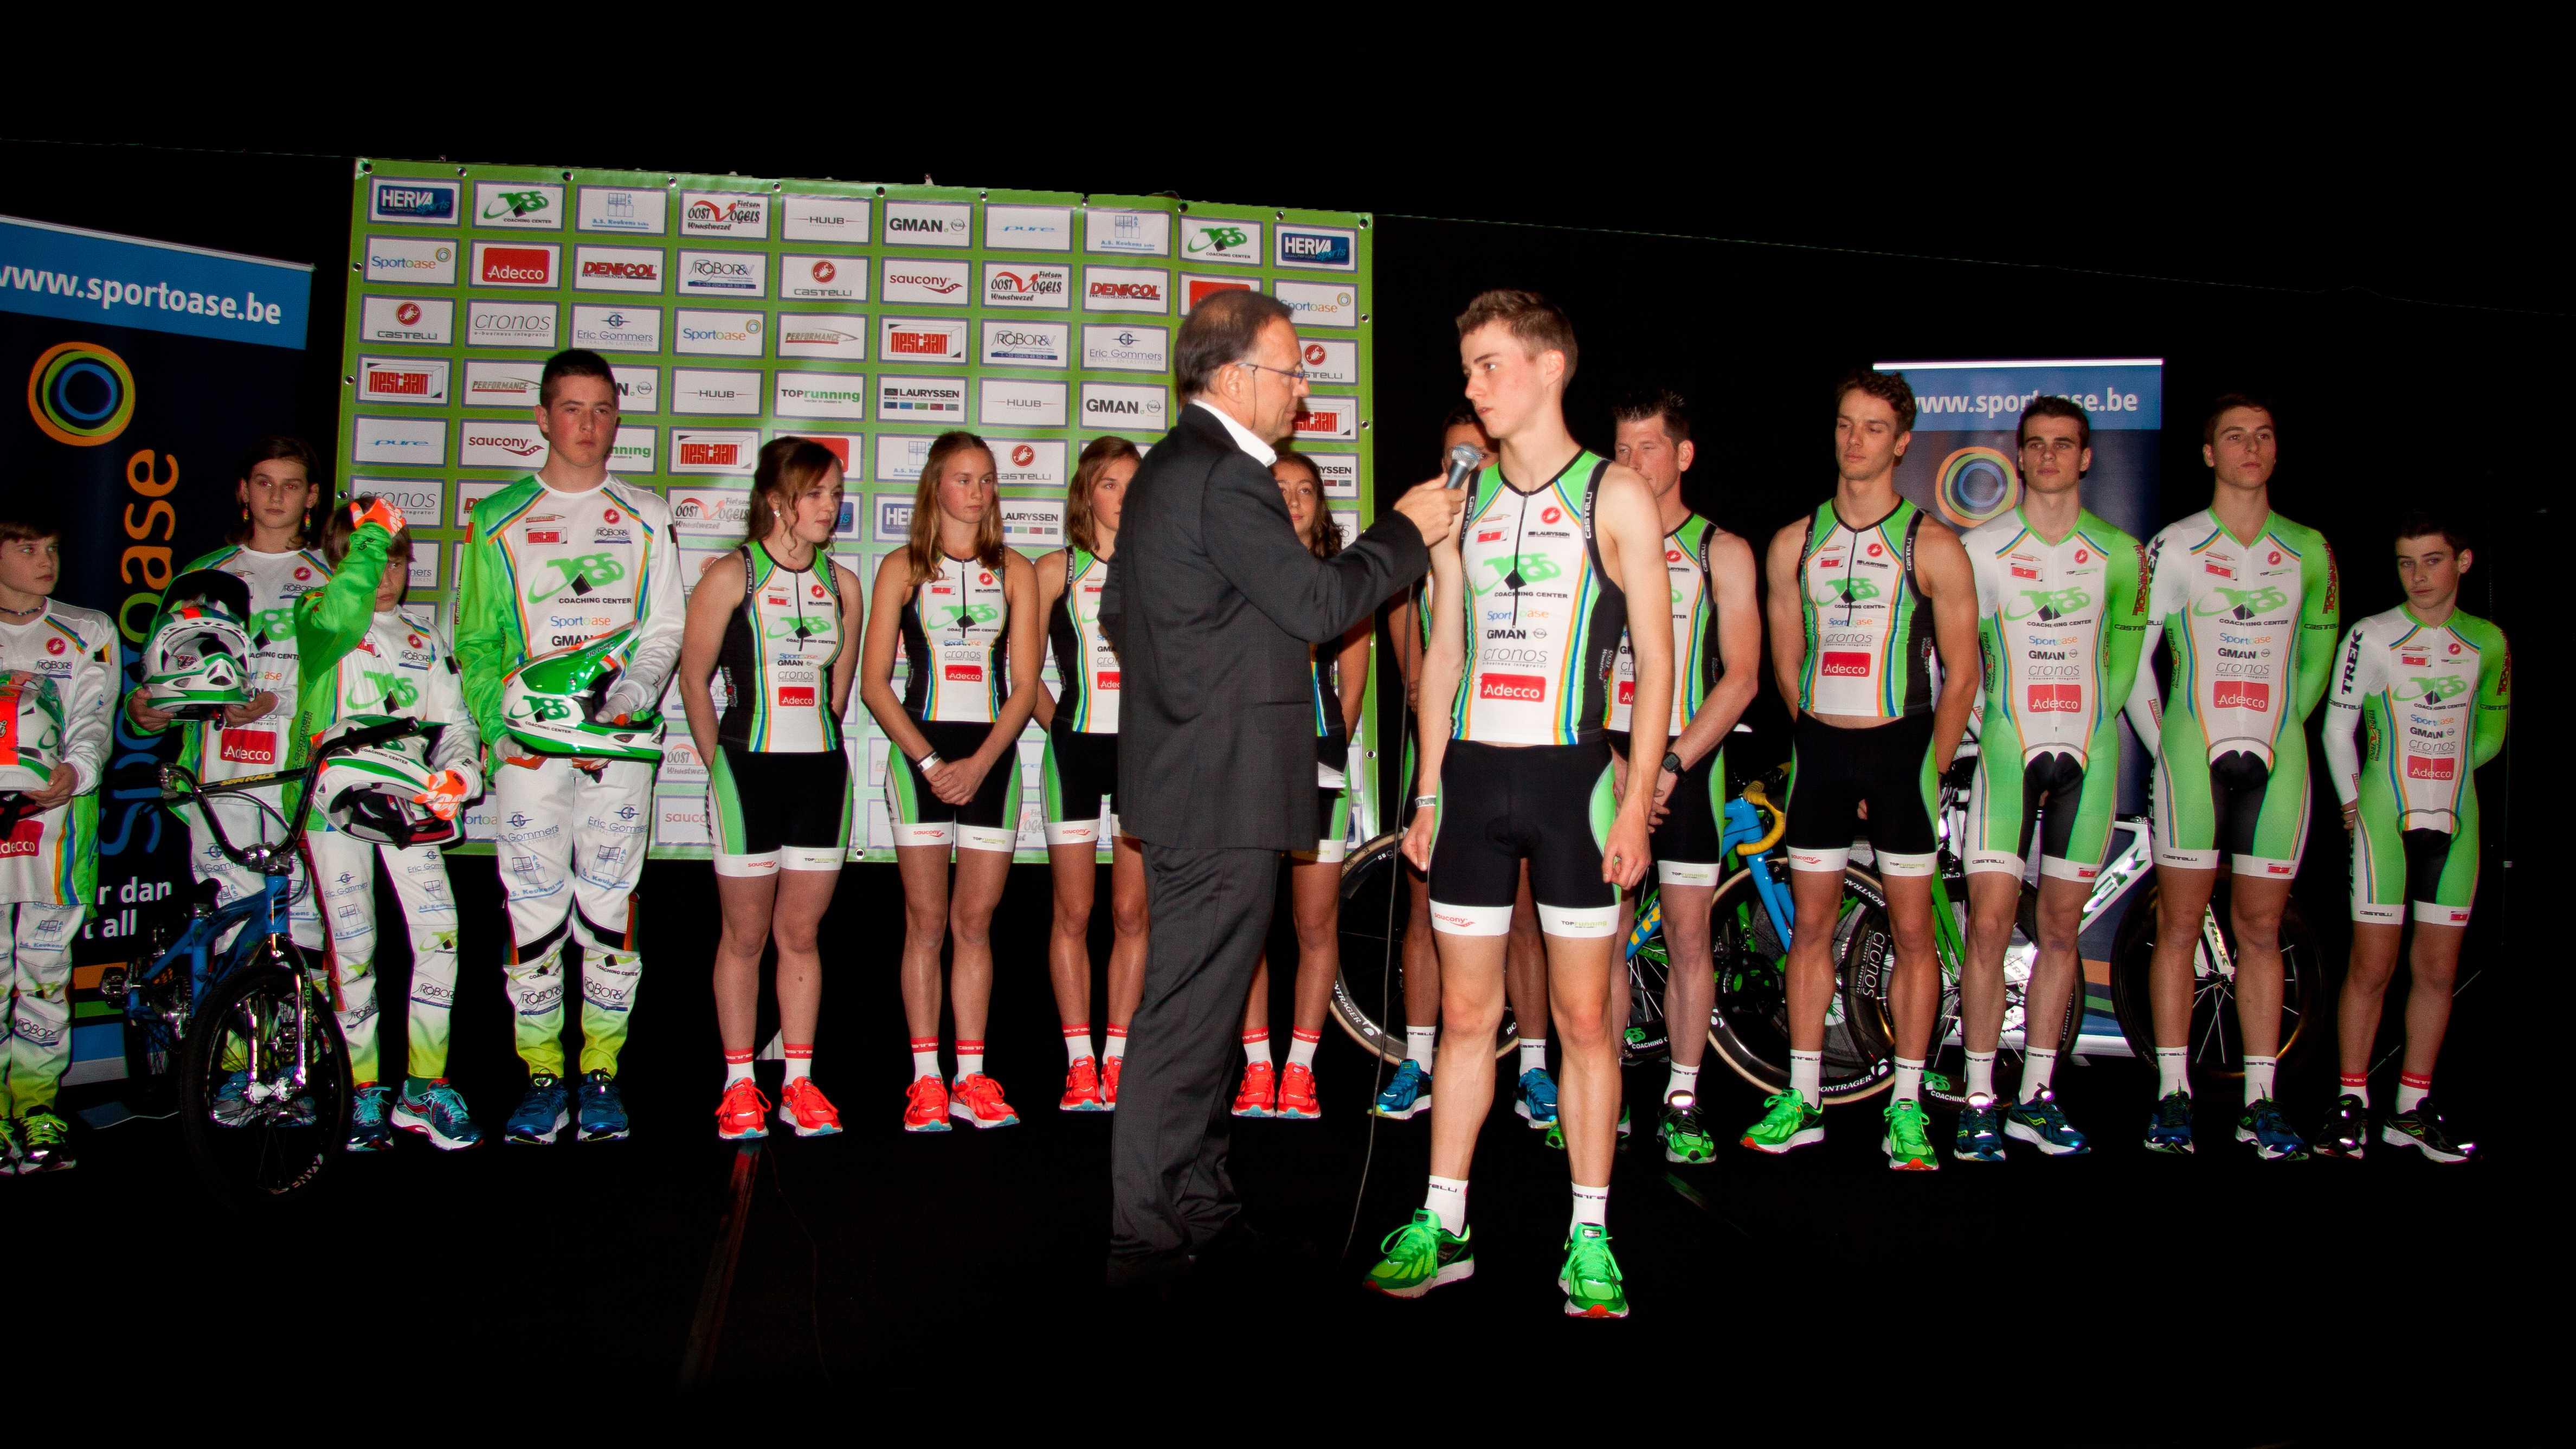 185-Sportoase-Castelli Omnium team voor 2015 bekendgemaakt